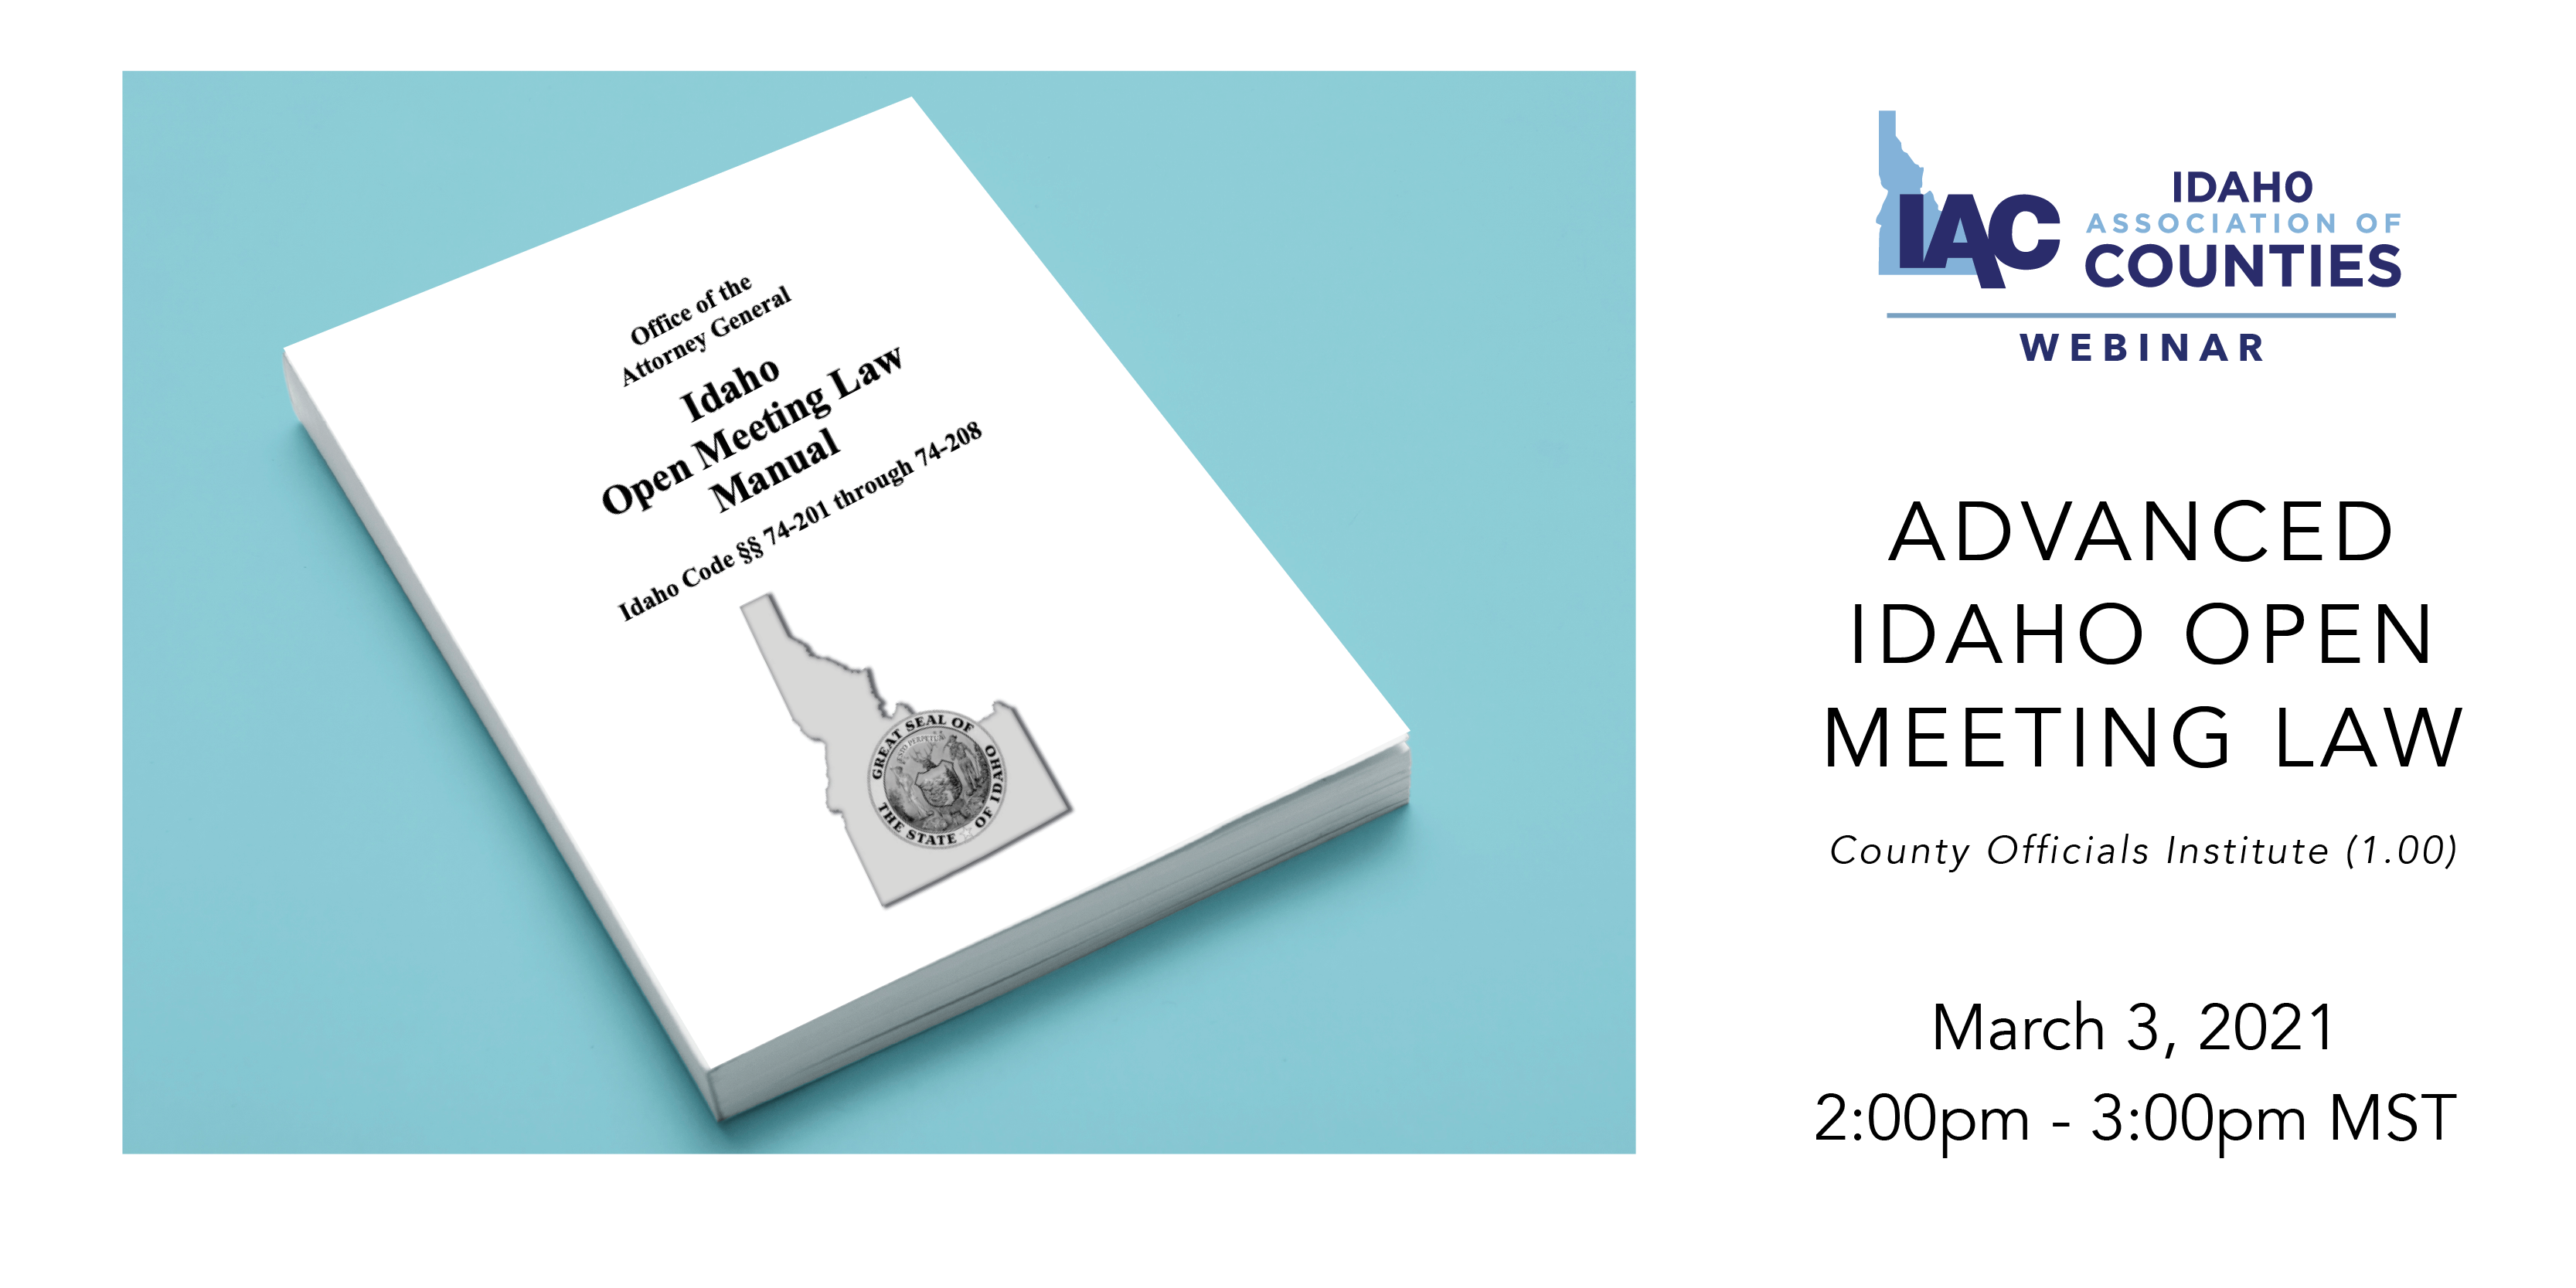 IAC Webinar: Advanced Idaho Open Meeting Law